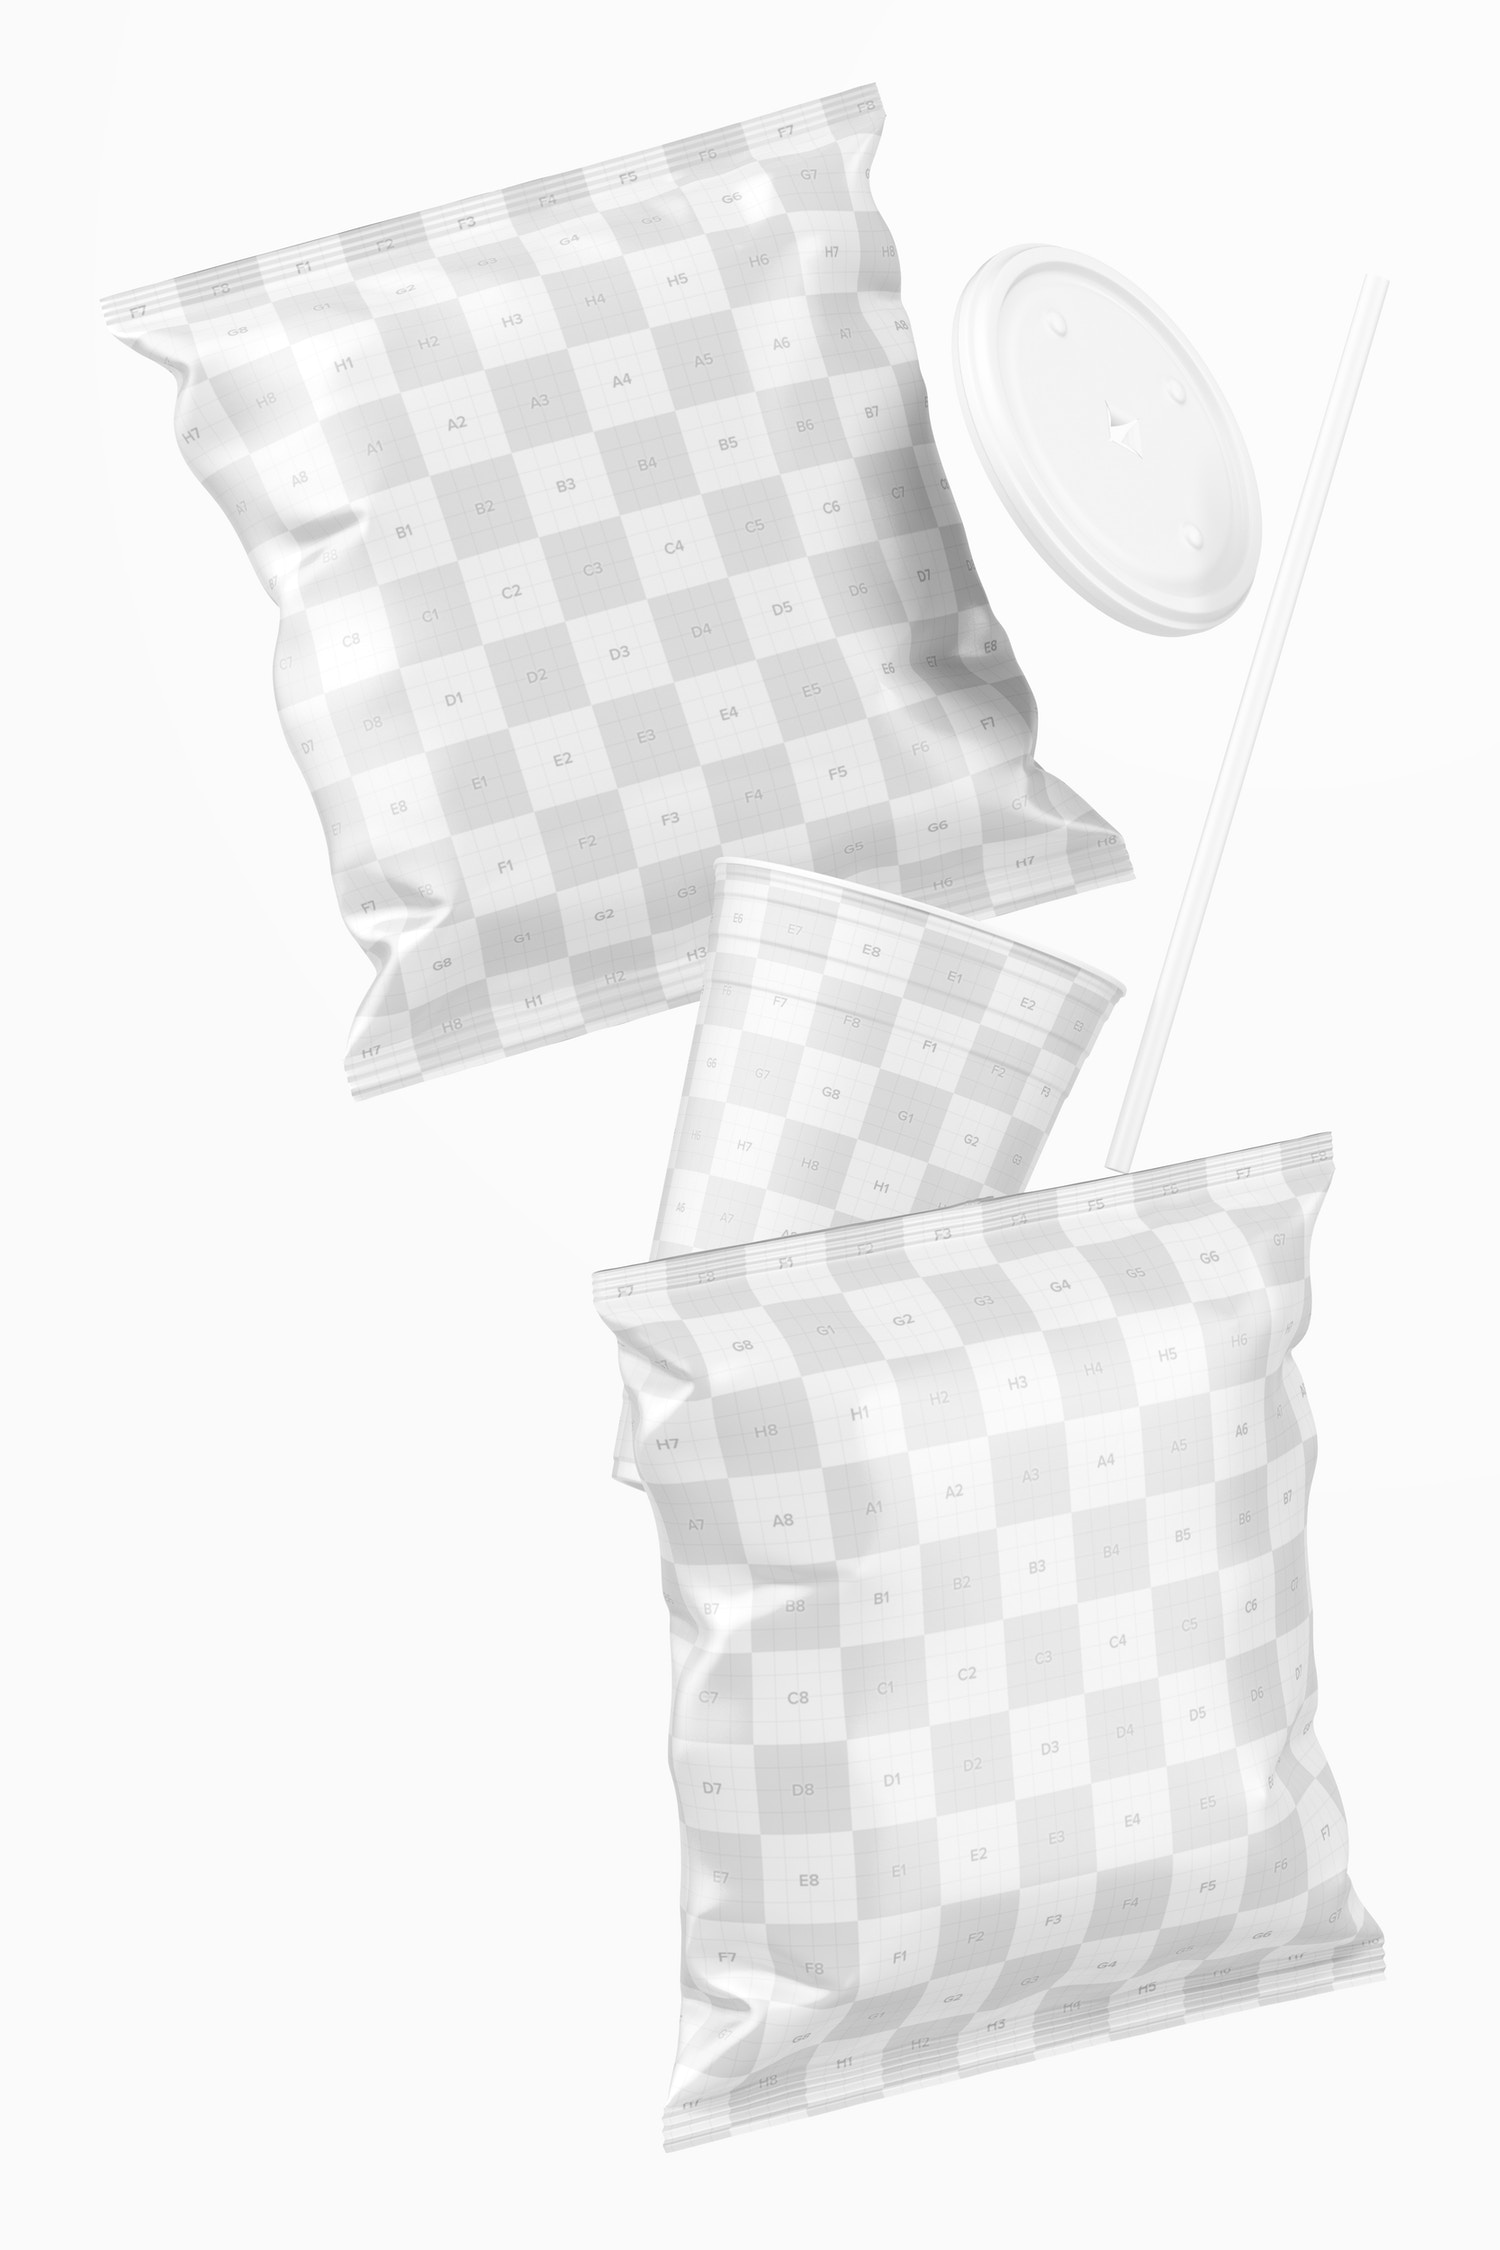 Stubby Chips Bag Mockup, Falling